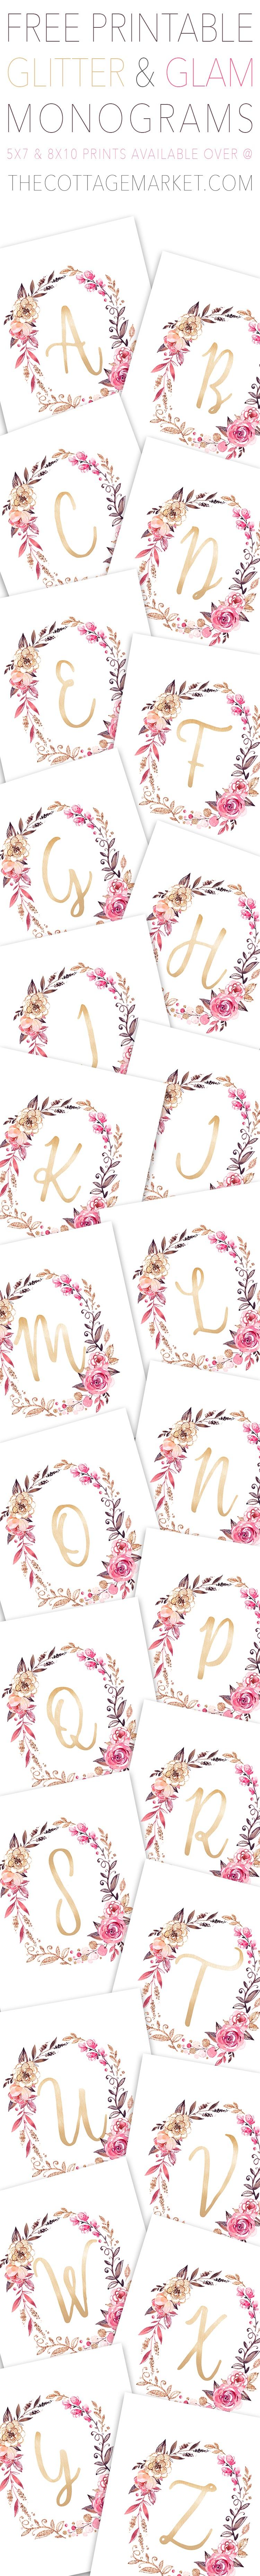 Free Glitter And Glam Monogram Printables   The Cottage Market - Free Printable Monogram Letters